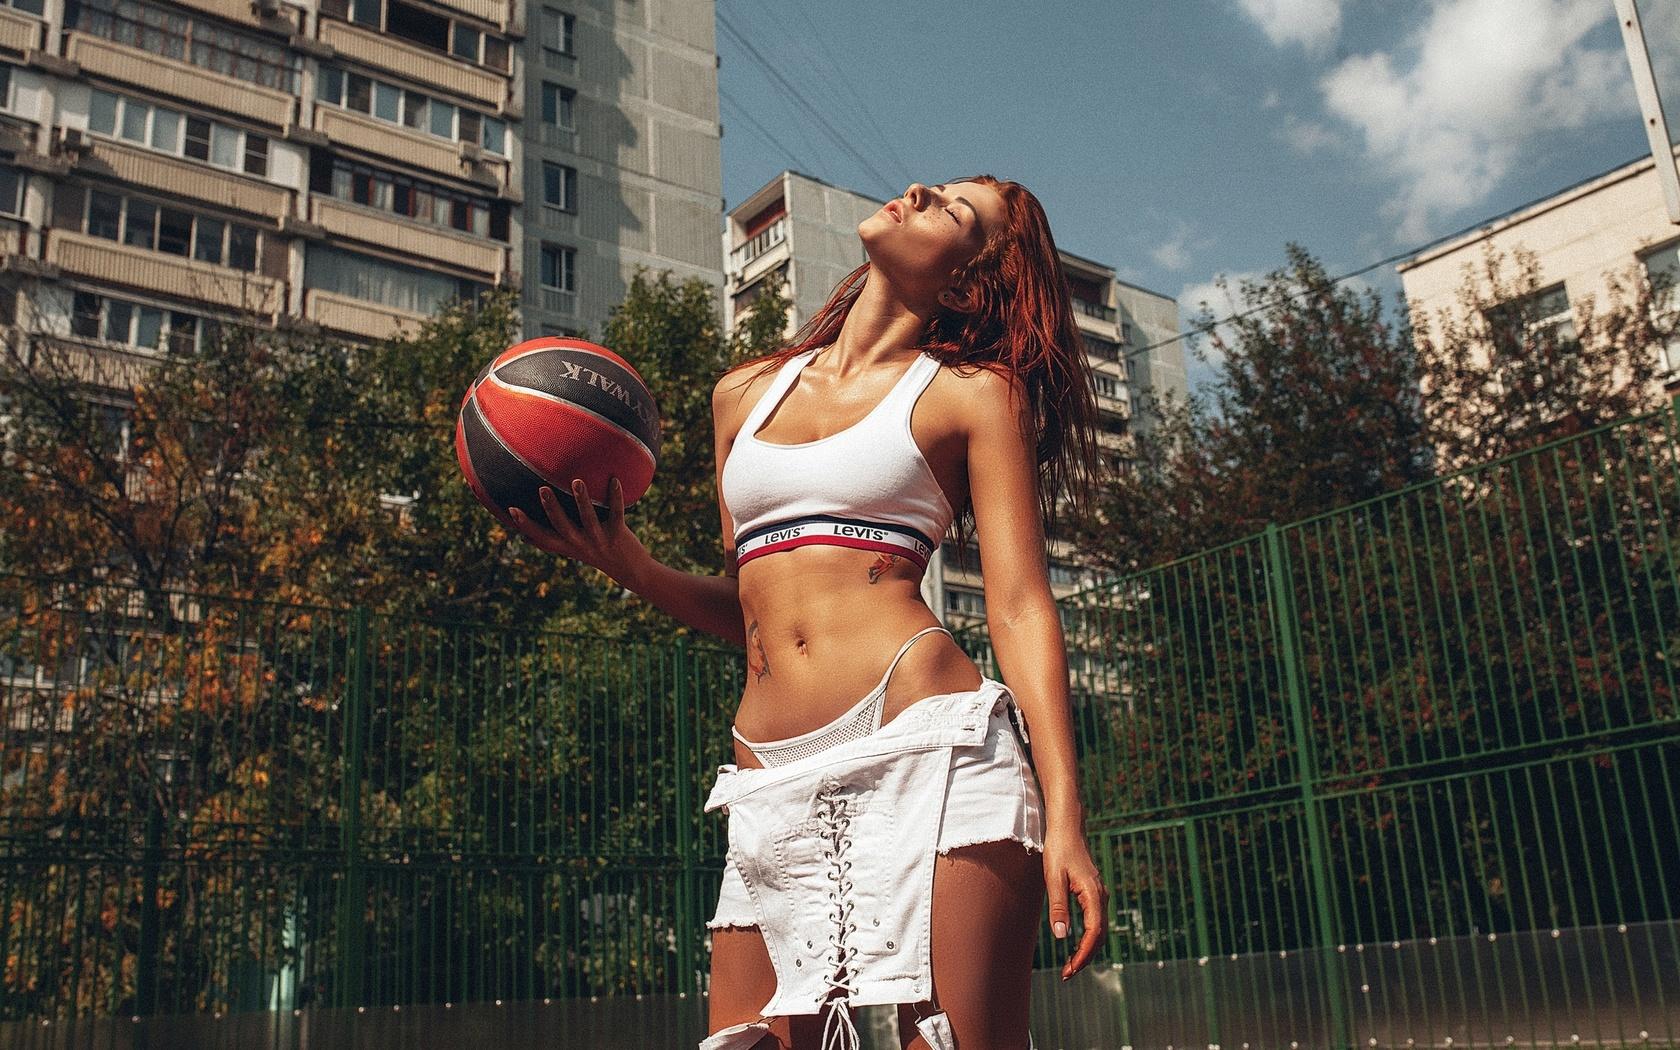 inga sunagatullina, women, ball, redhead, closed eyes, white tops, belly, thong, tattoo, building, women outdoors, overalls